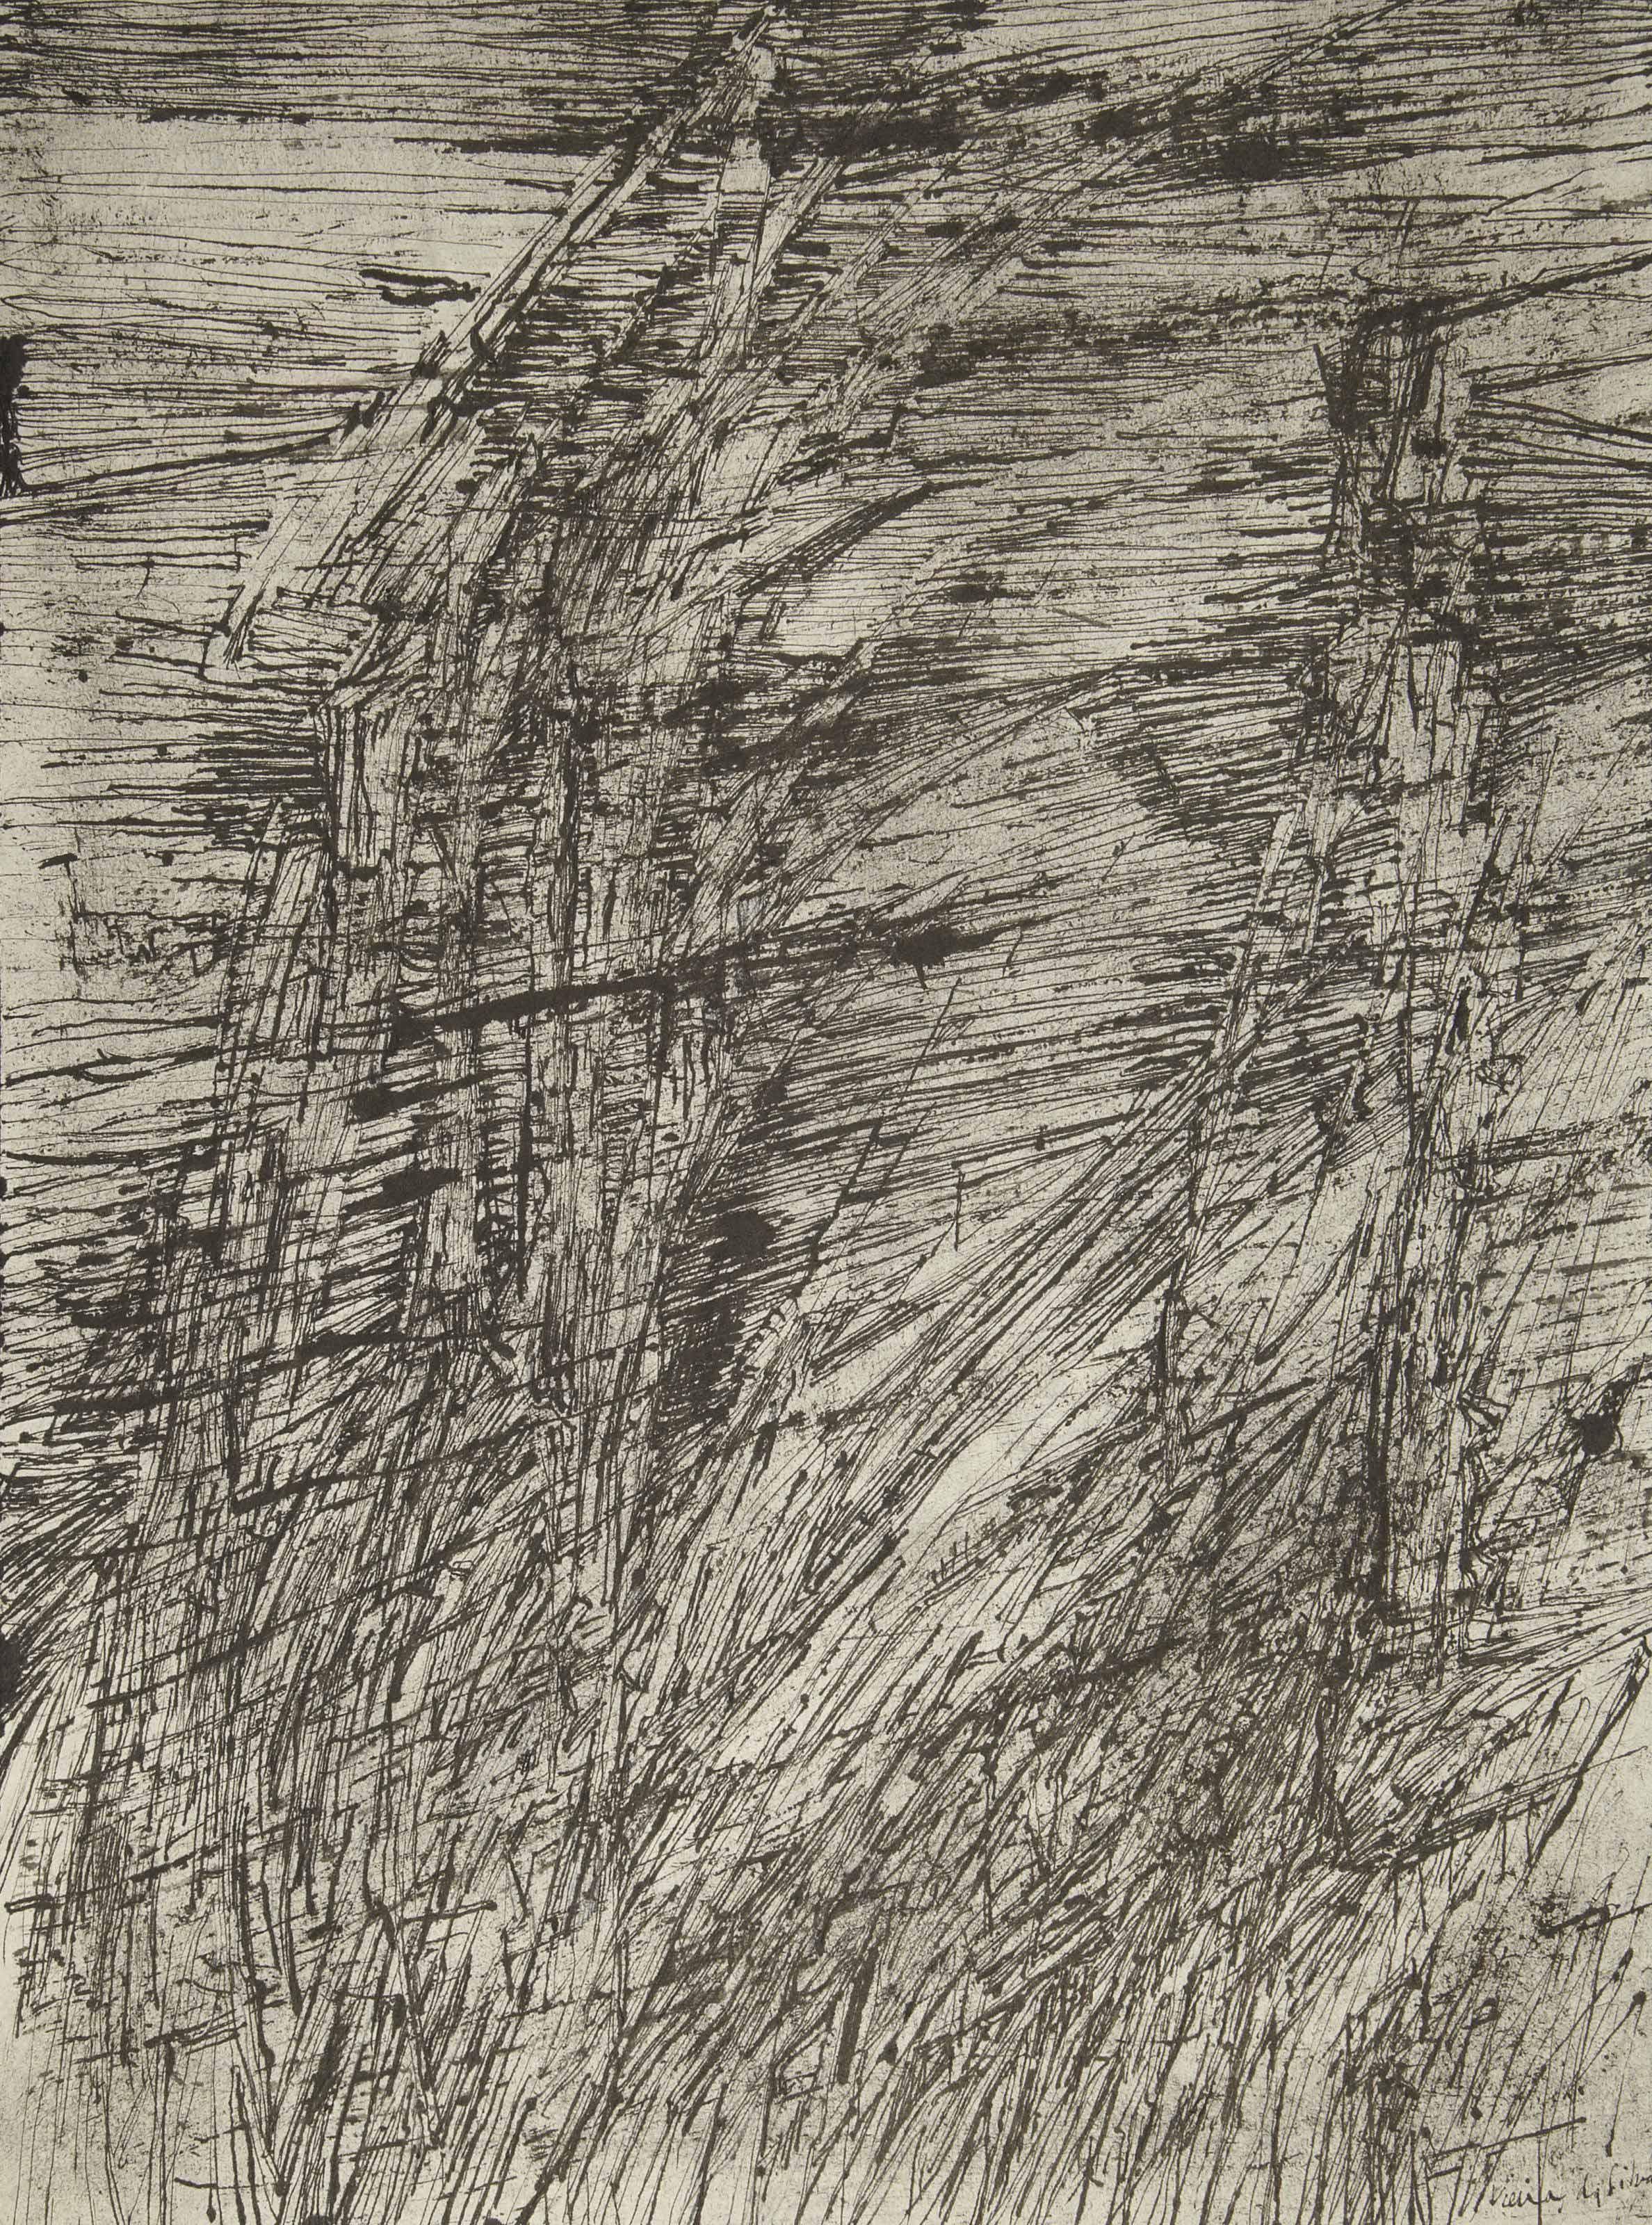 [VIEIRA DA SILVA] -- CHAR, René (1907-1988). L'Inclémence lointaine. Avec vingt-cinq gravures au burin de Vieira da Silva. Paris: Pierre Berès, 1961.